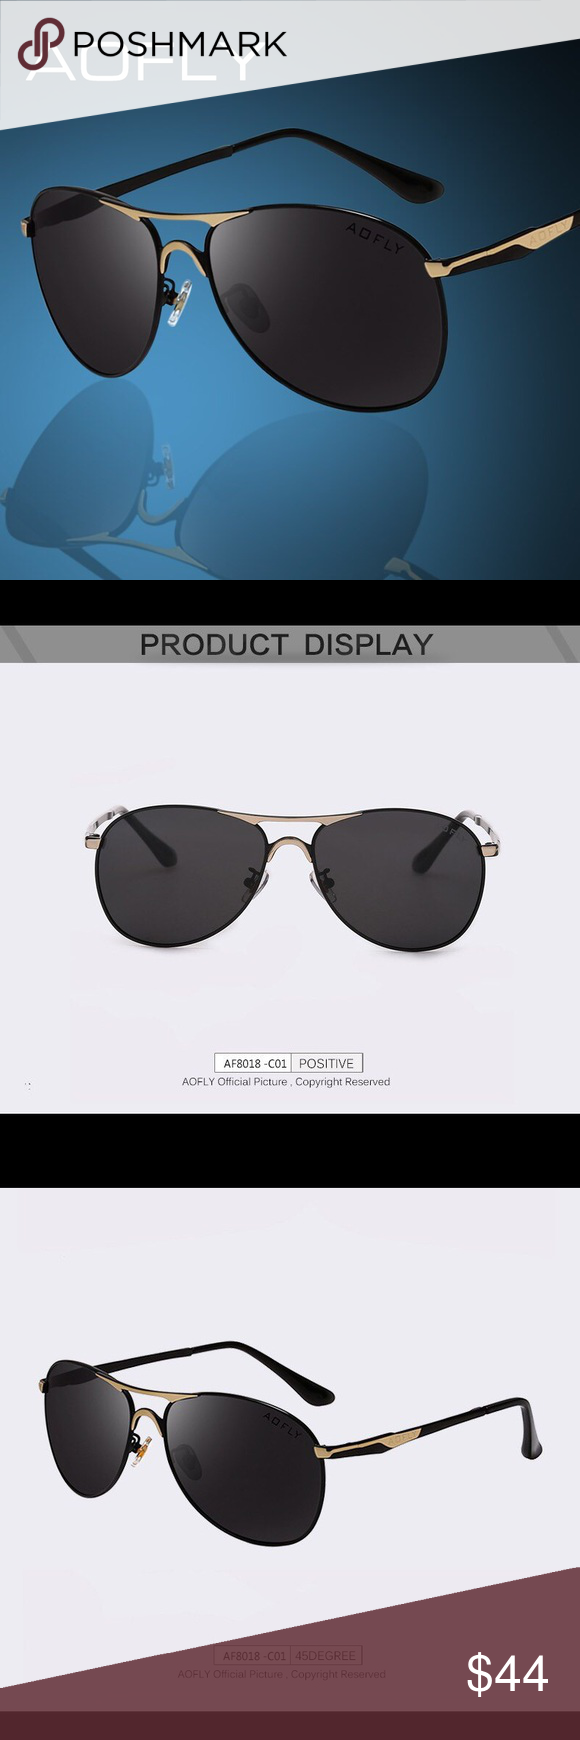 91ef76658cd AOFLY Authentic Men s Aviator Sunglasses